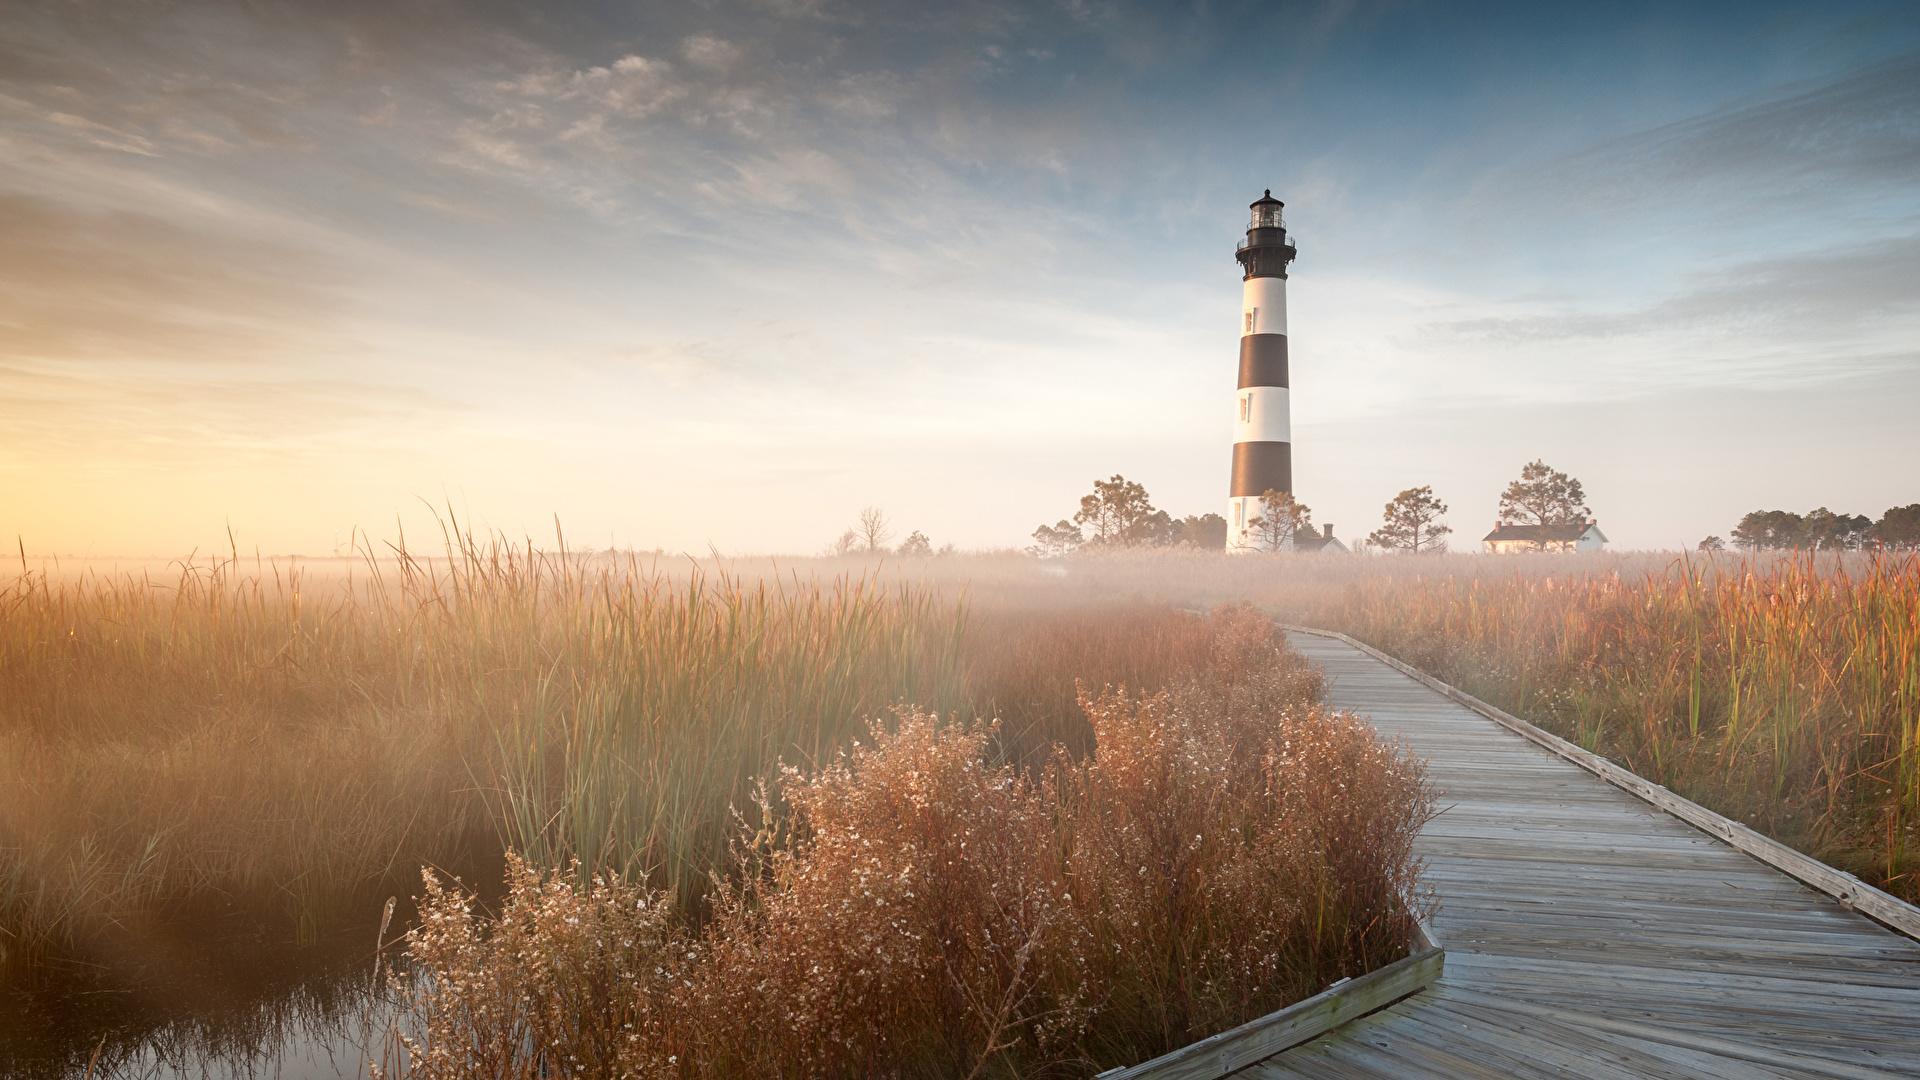 Image USA Bodie Island North Carolina Nature Lighthouses 1920x1080 1920x1080